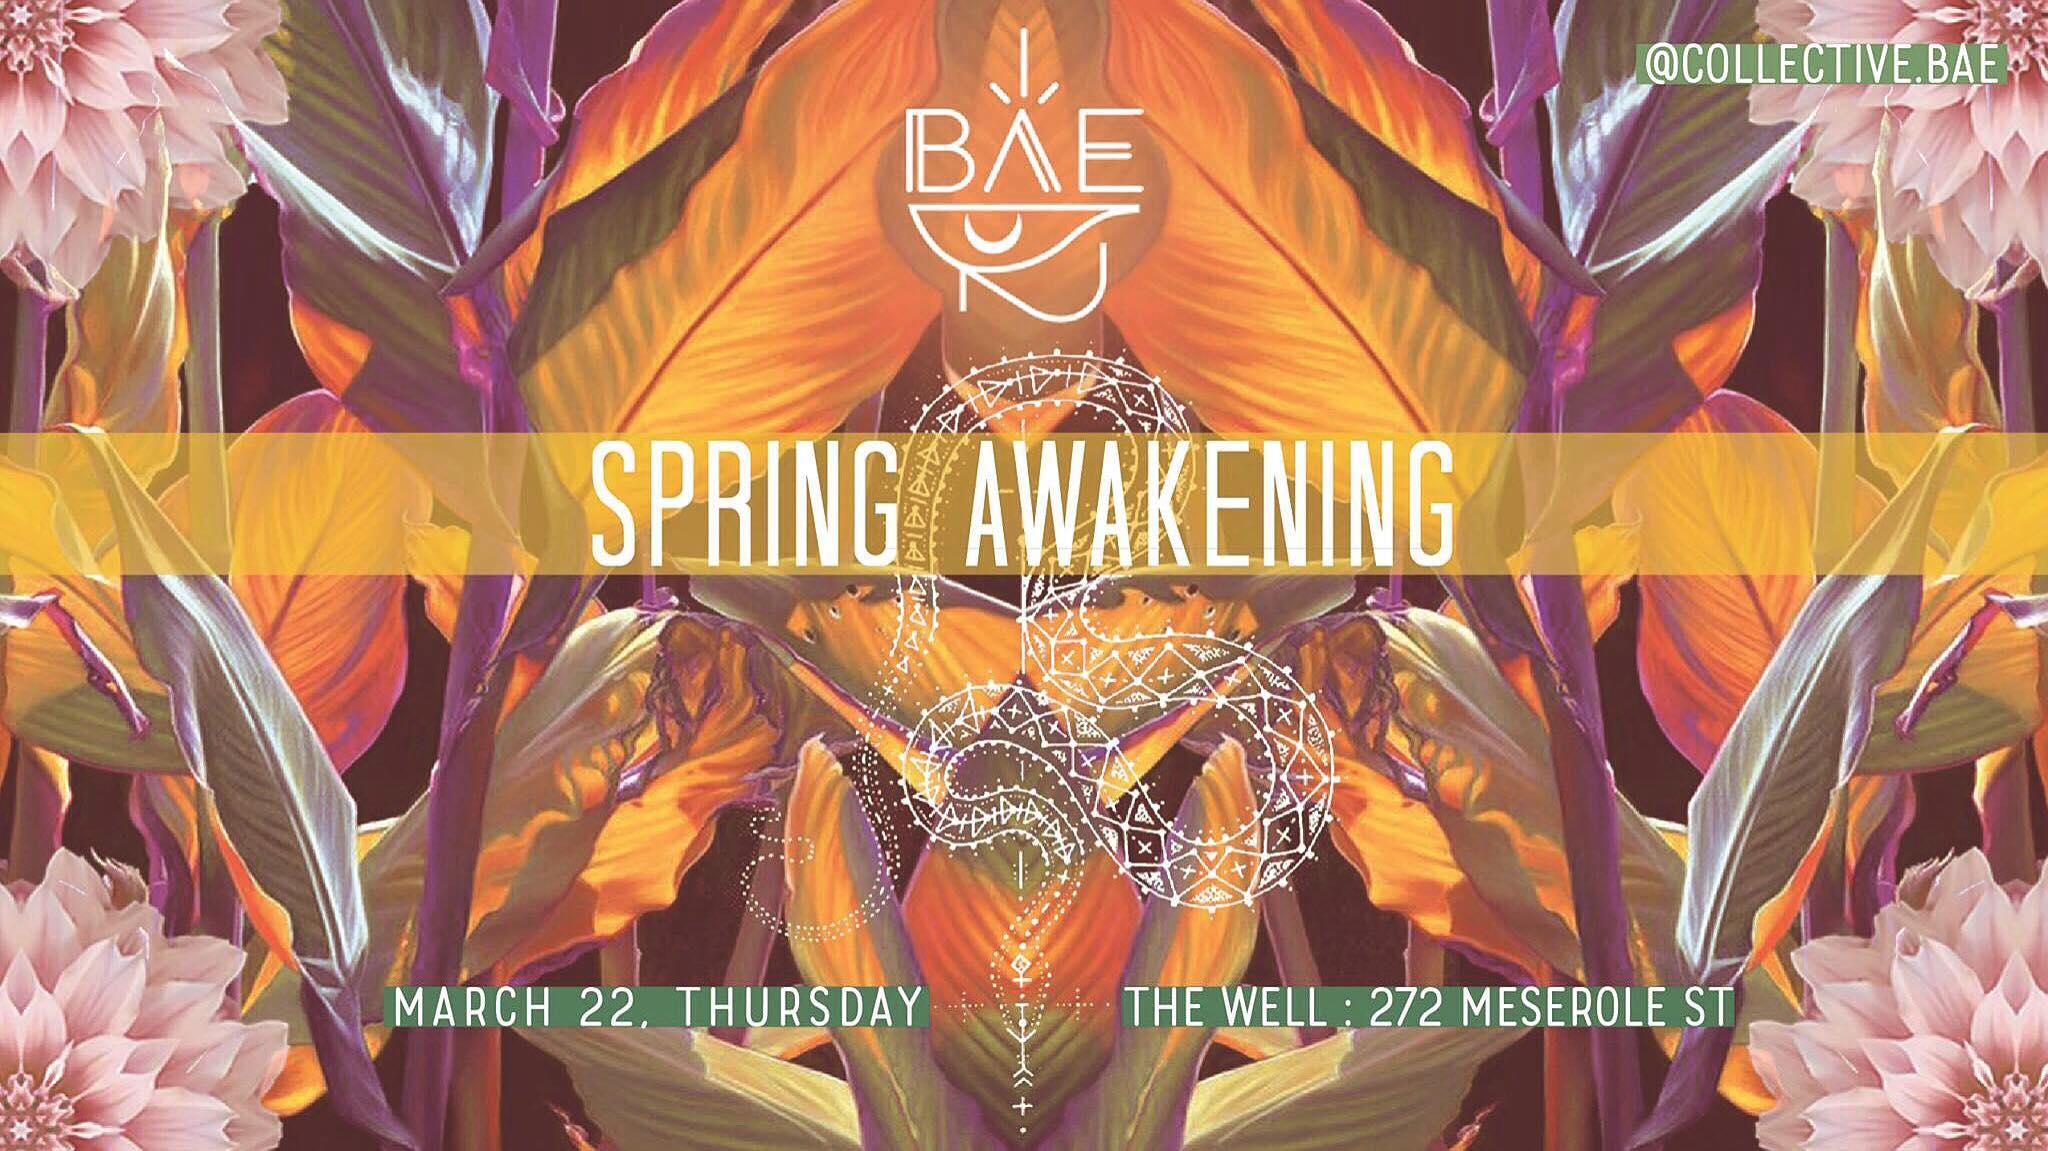 BAE:SpringAwakening.jpg